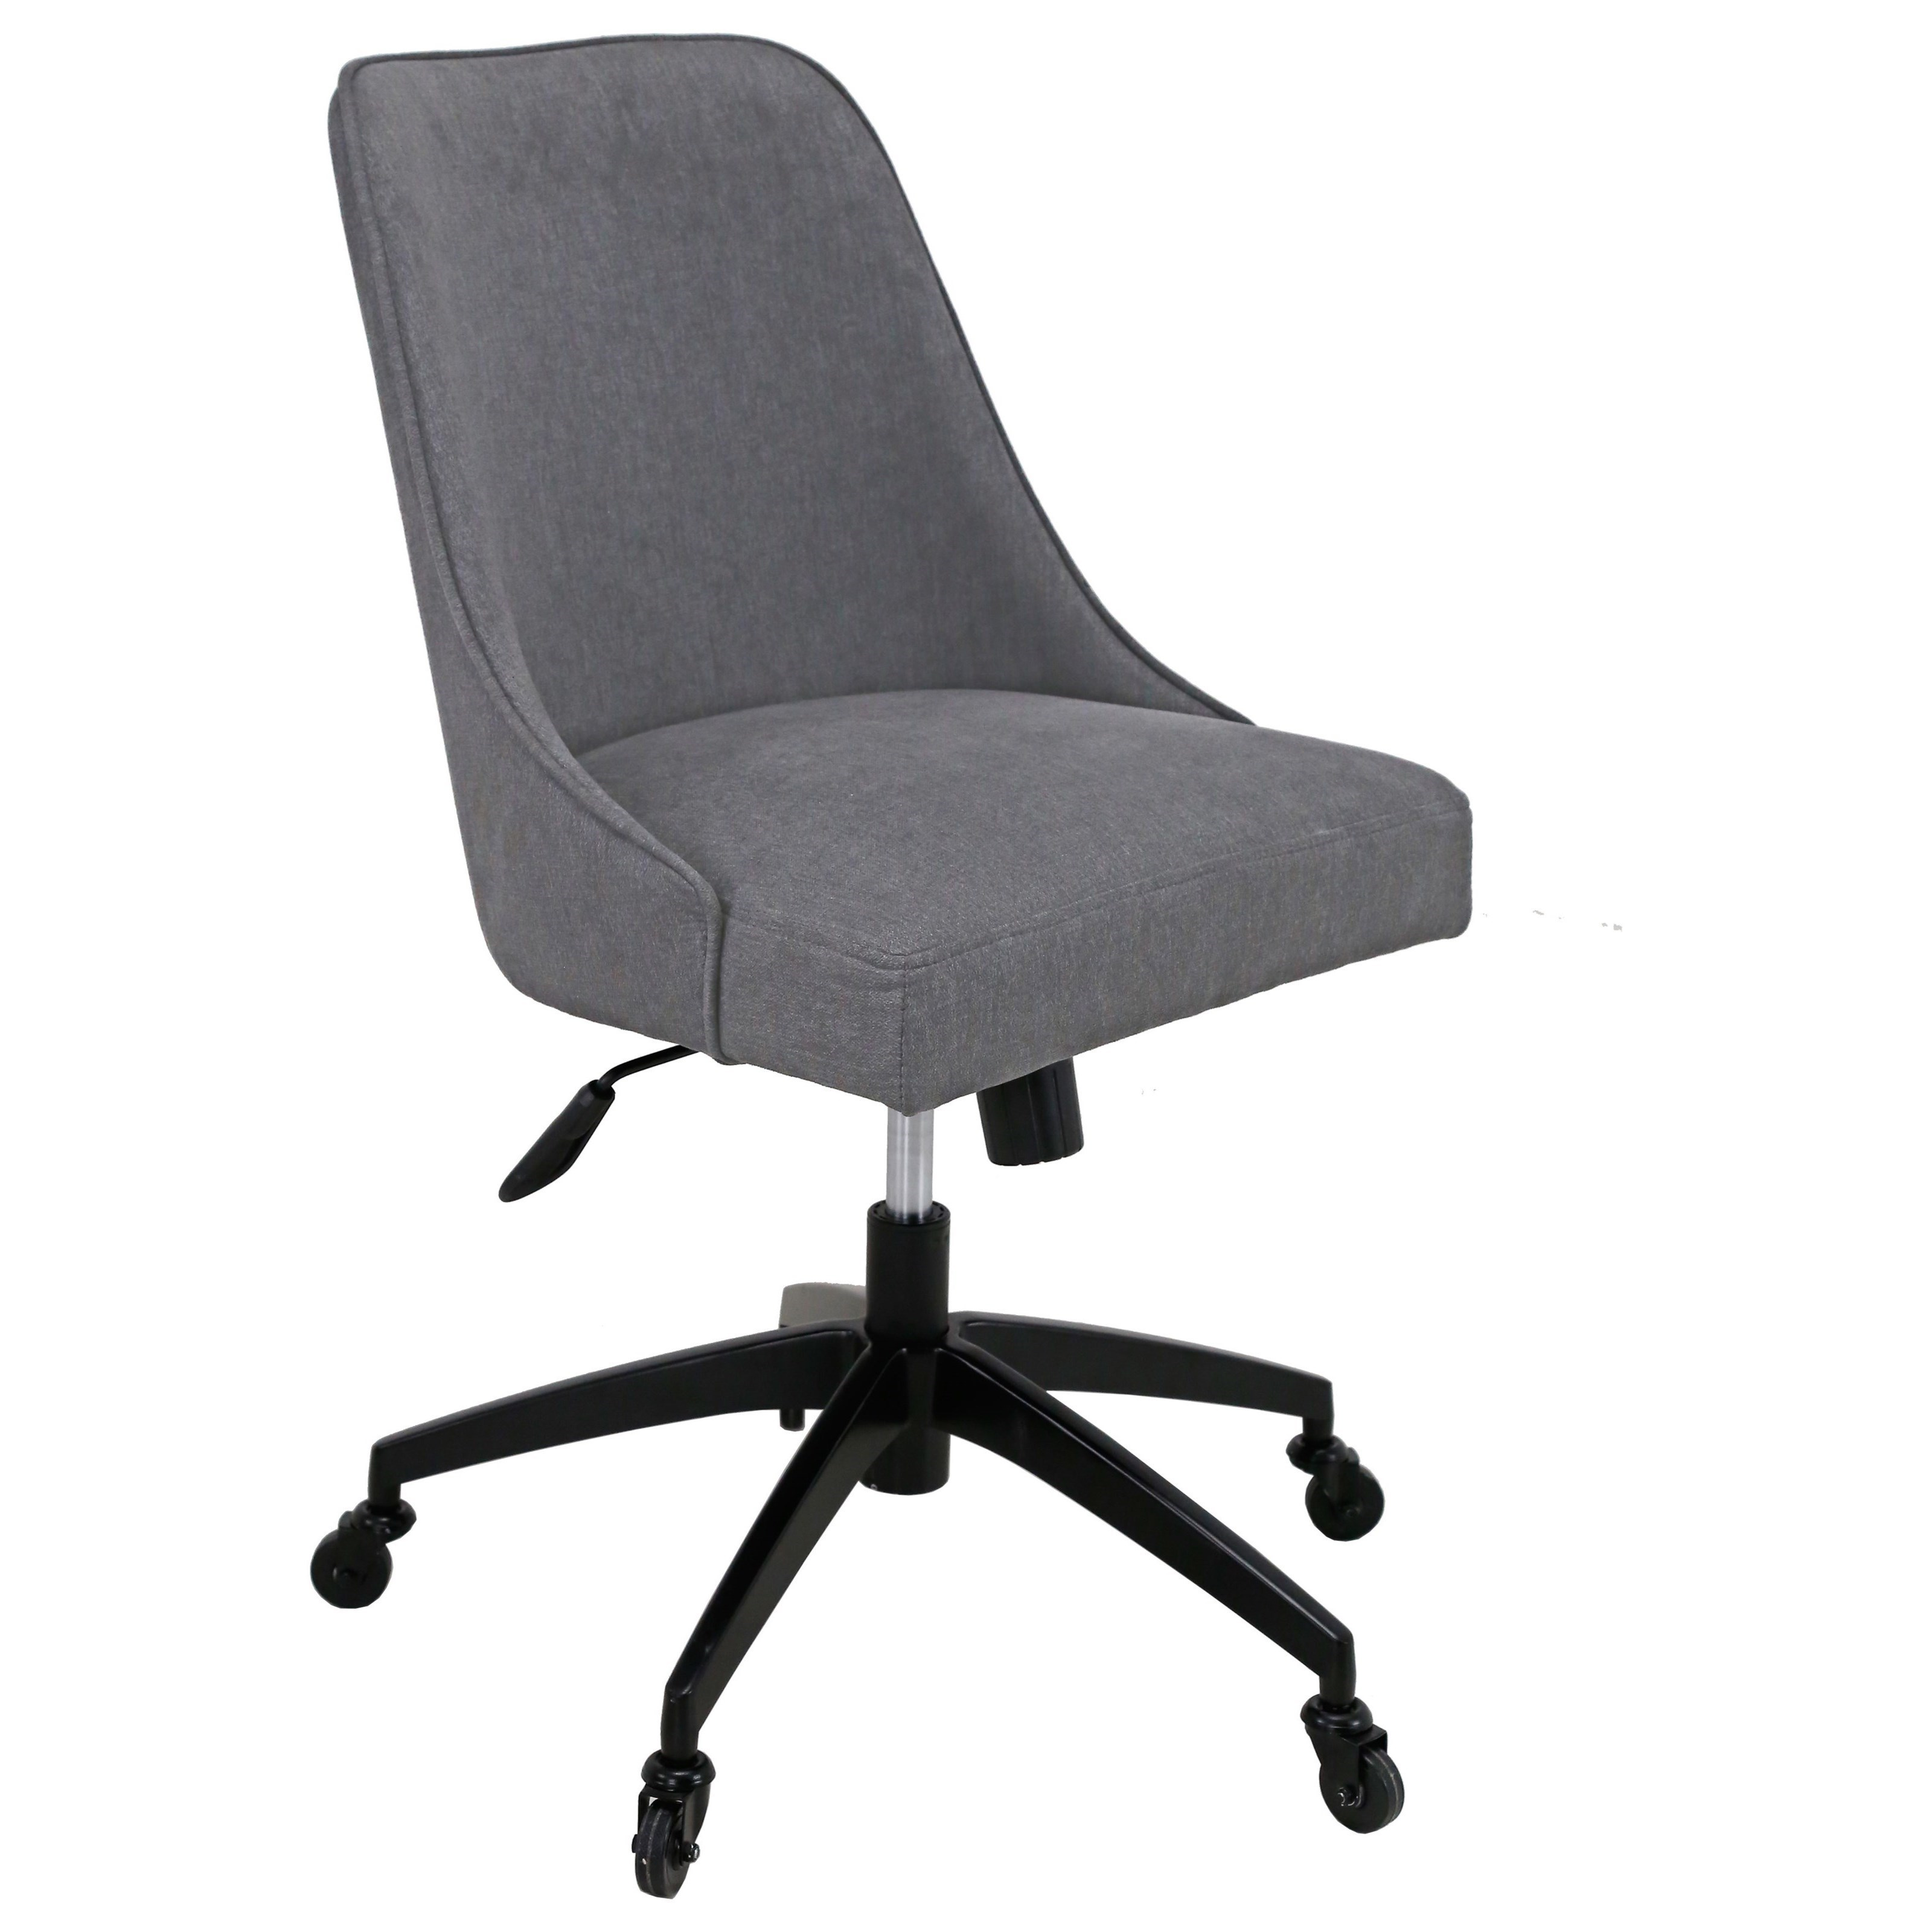 Swivel Upholstered Desk Chair in Gray Fabric